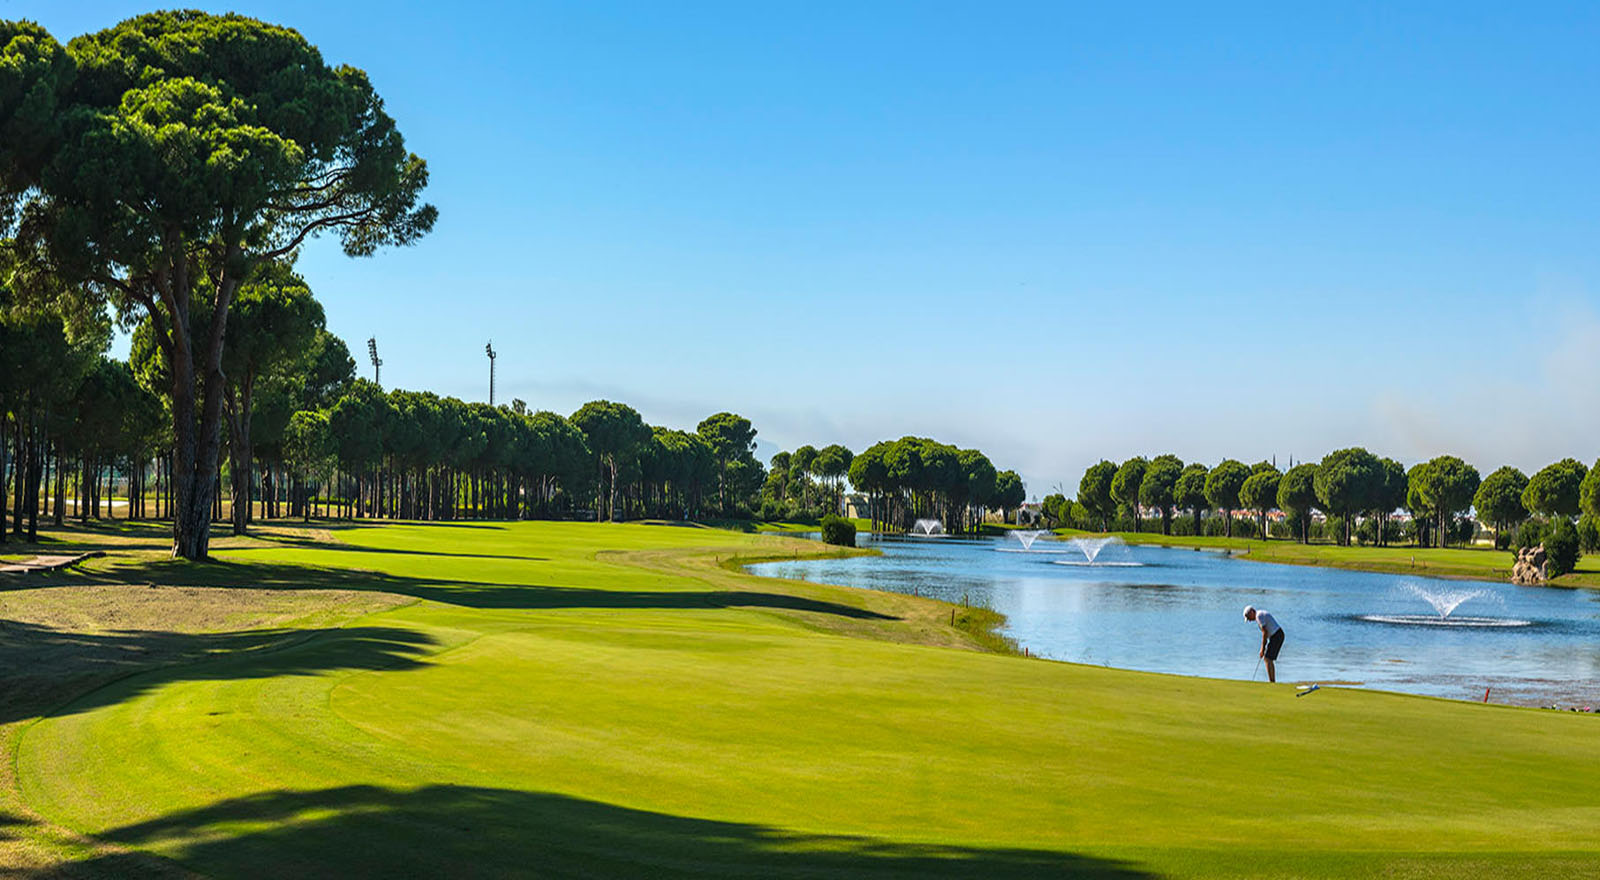 golf-sahasi-yapan-firmalar